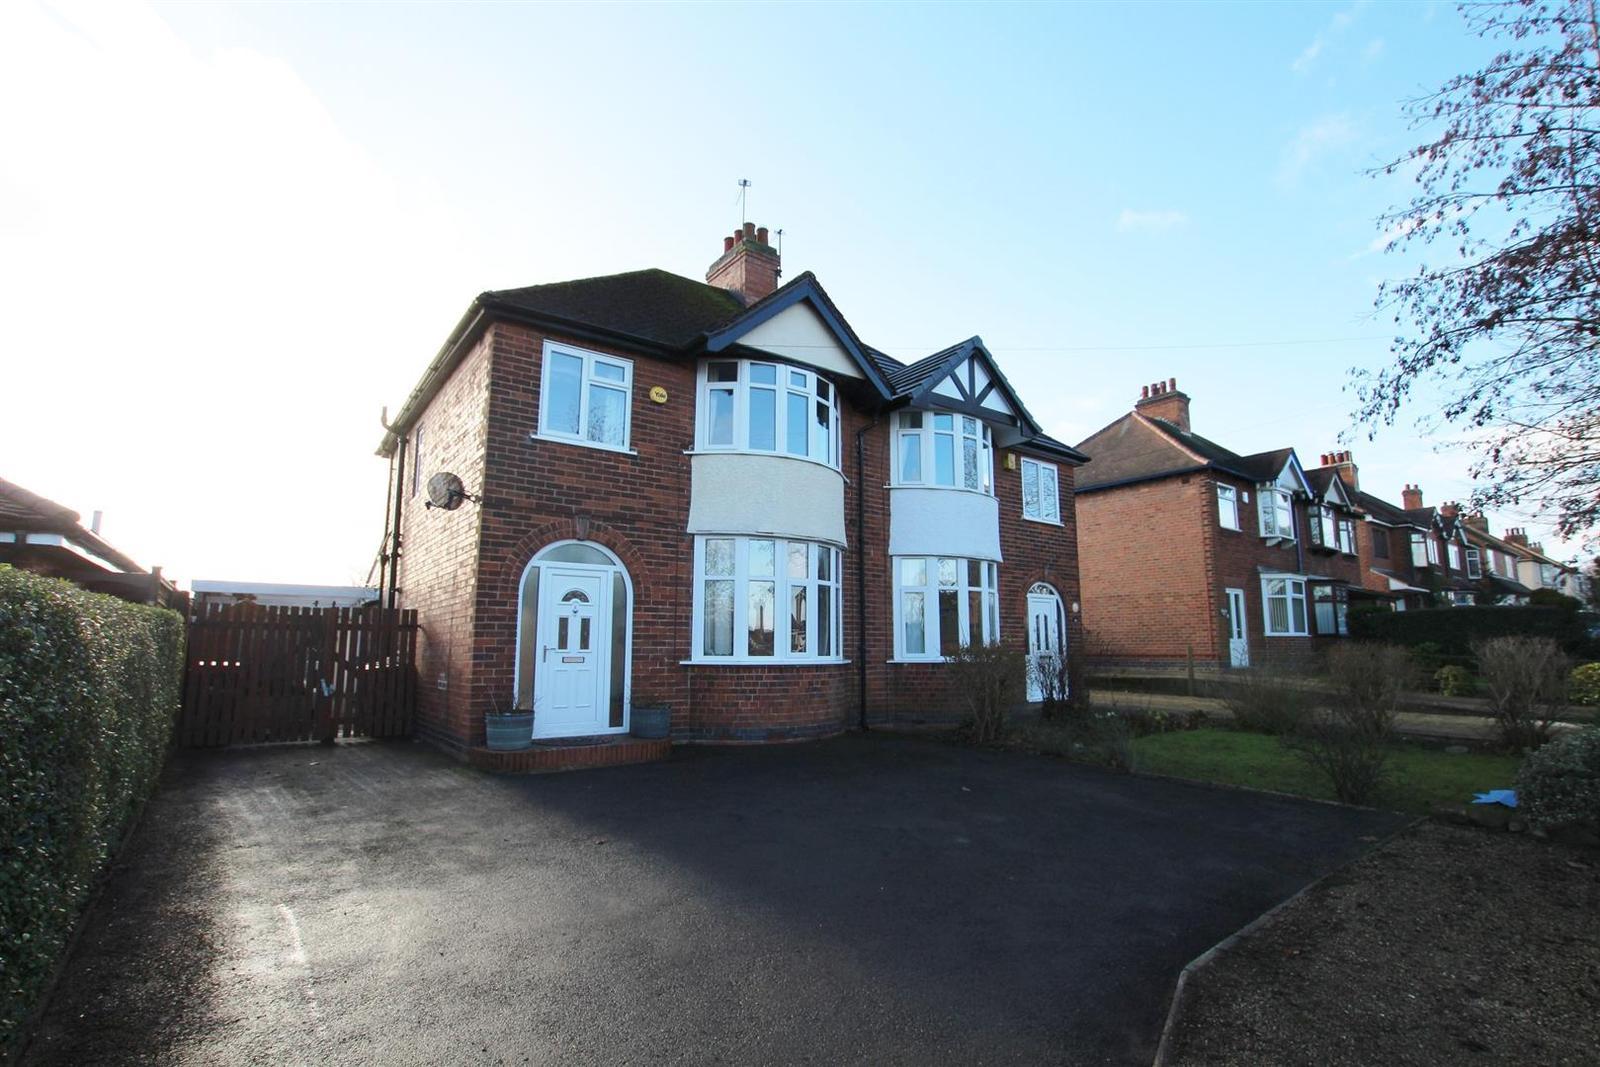 3 Bedrooms Property for sale in Henhurst Hill, Burton